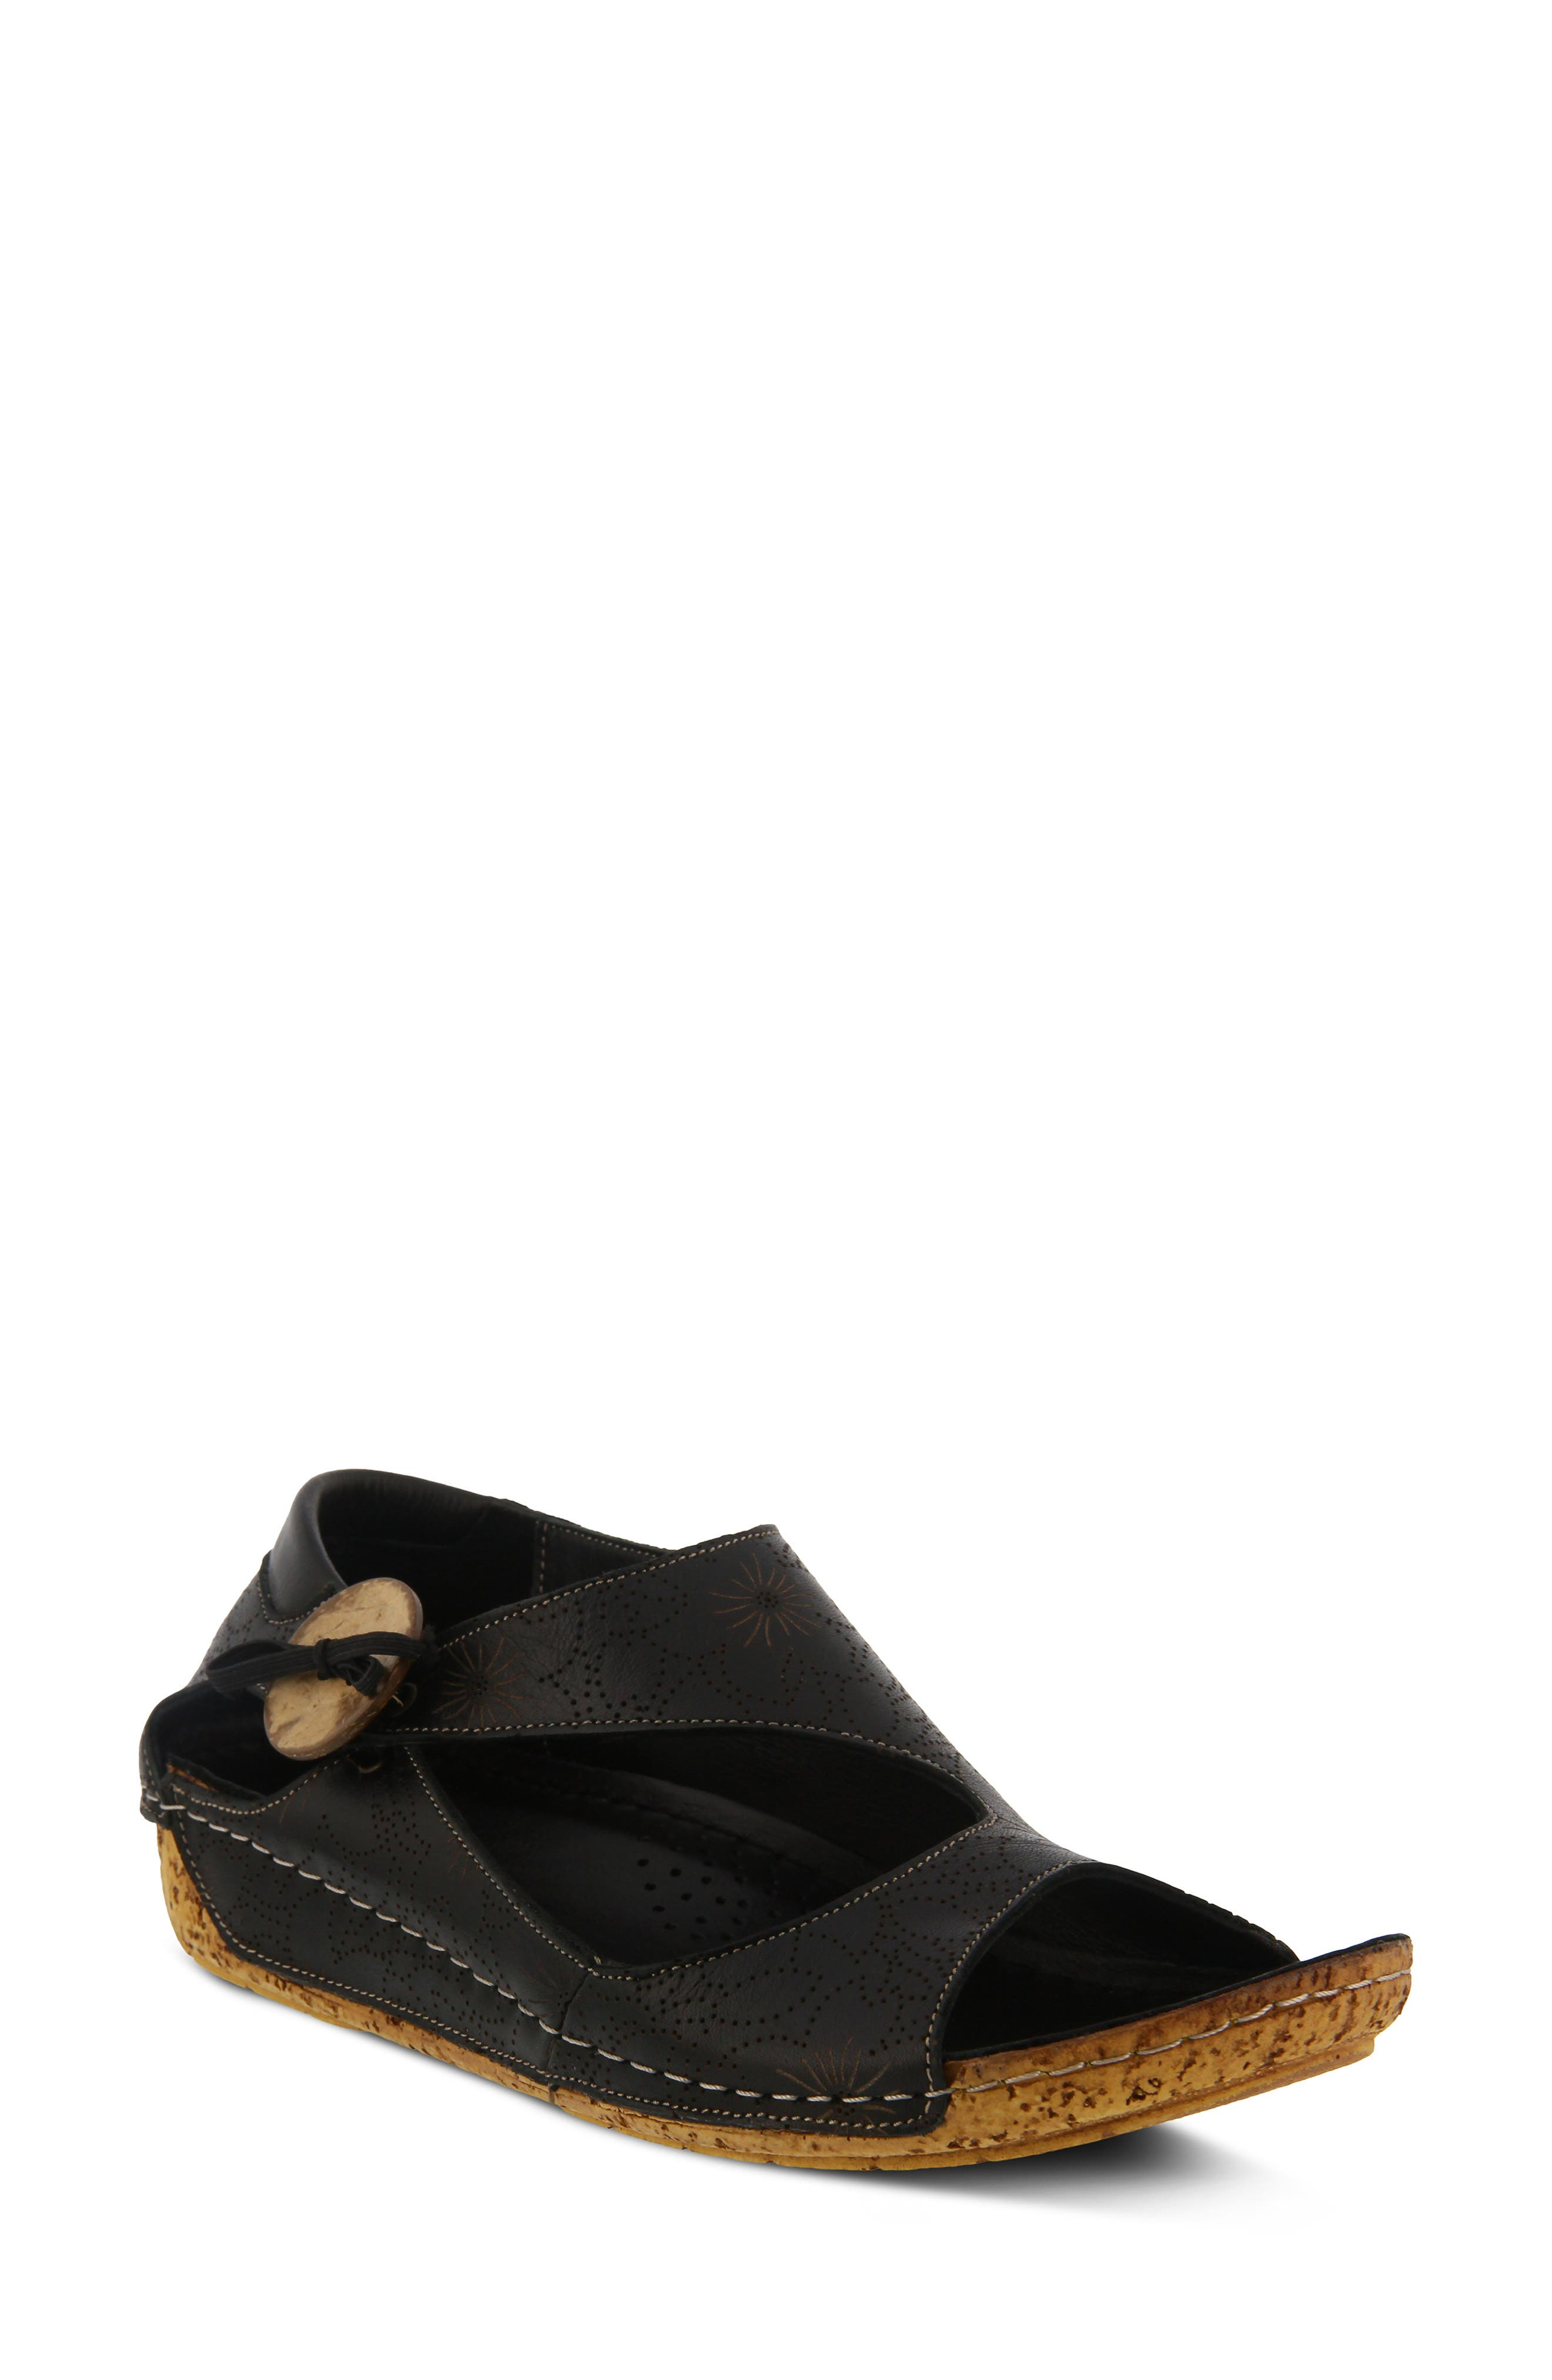 Spring Step Lorelle Flat - Black